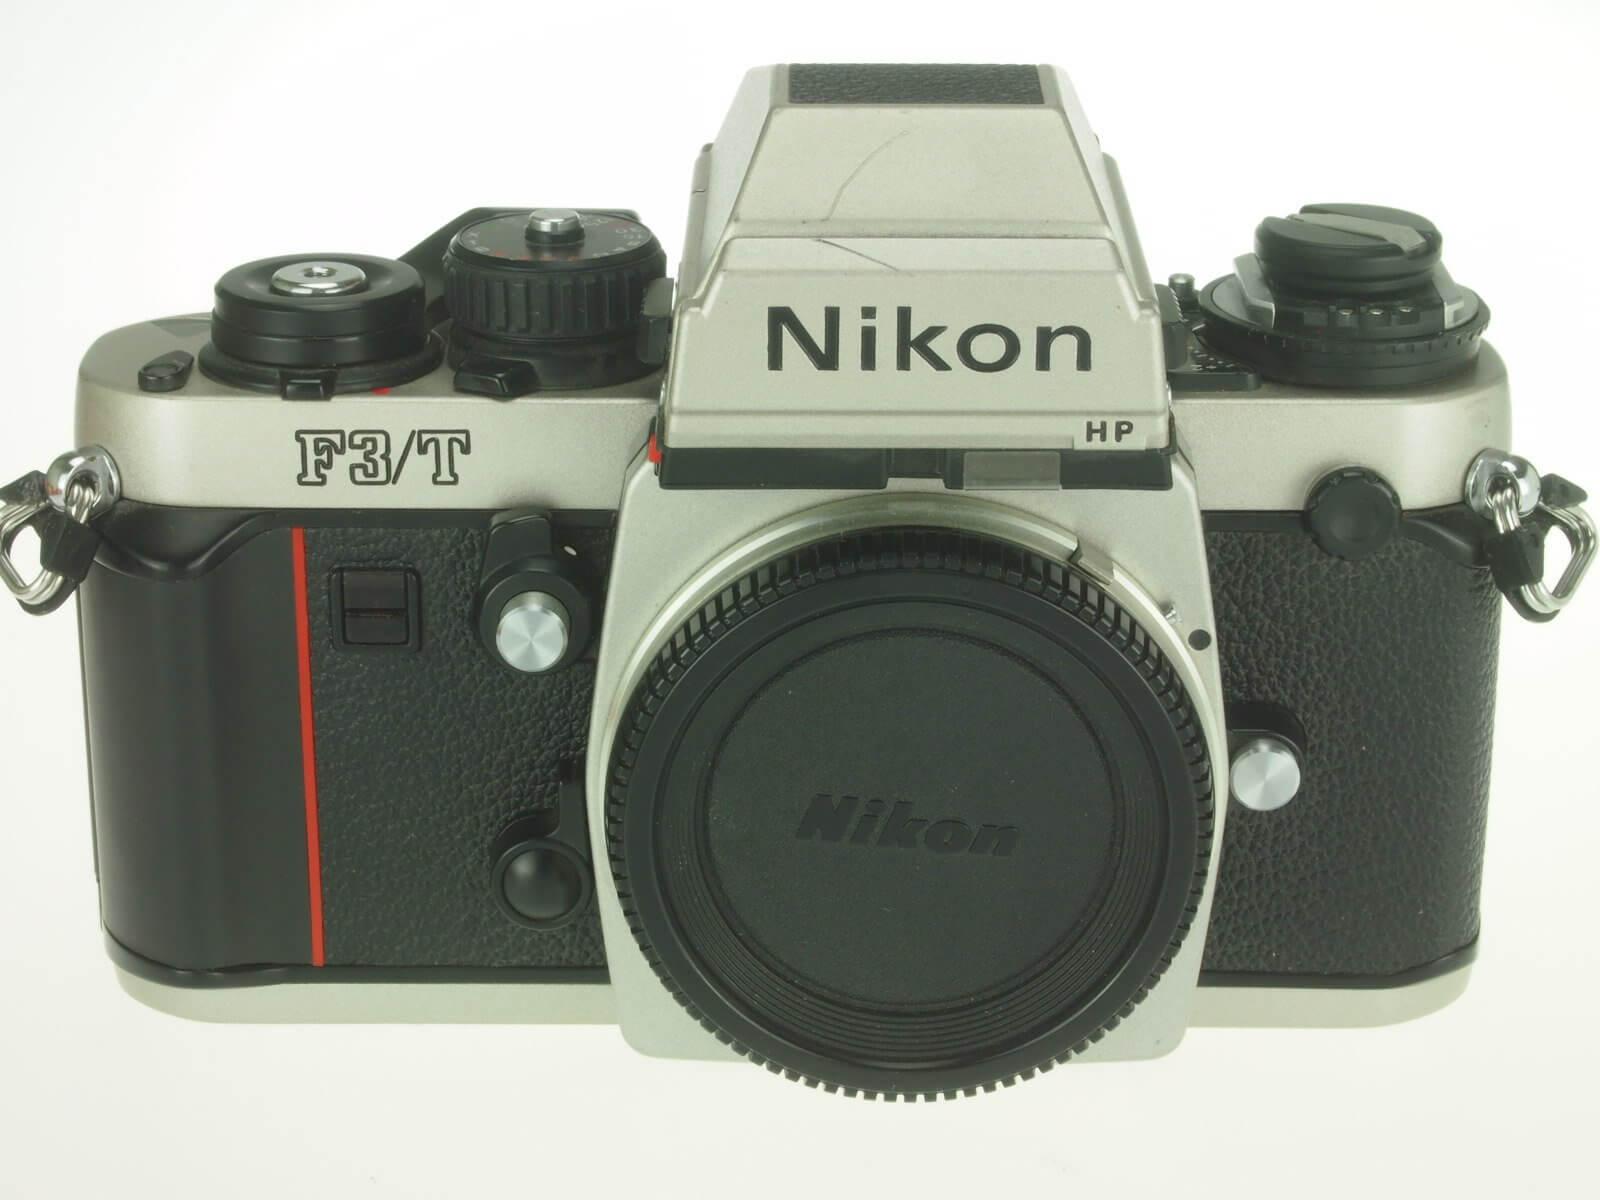 Nikon F3T body, champagne, gorgeous condition!